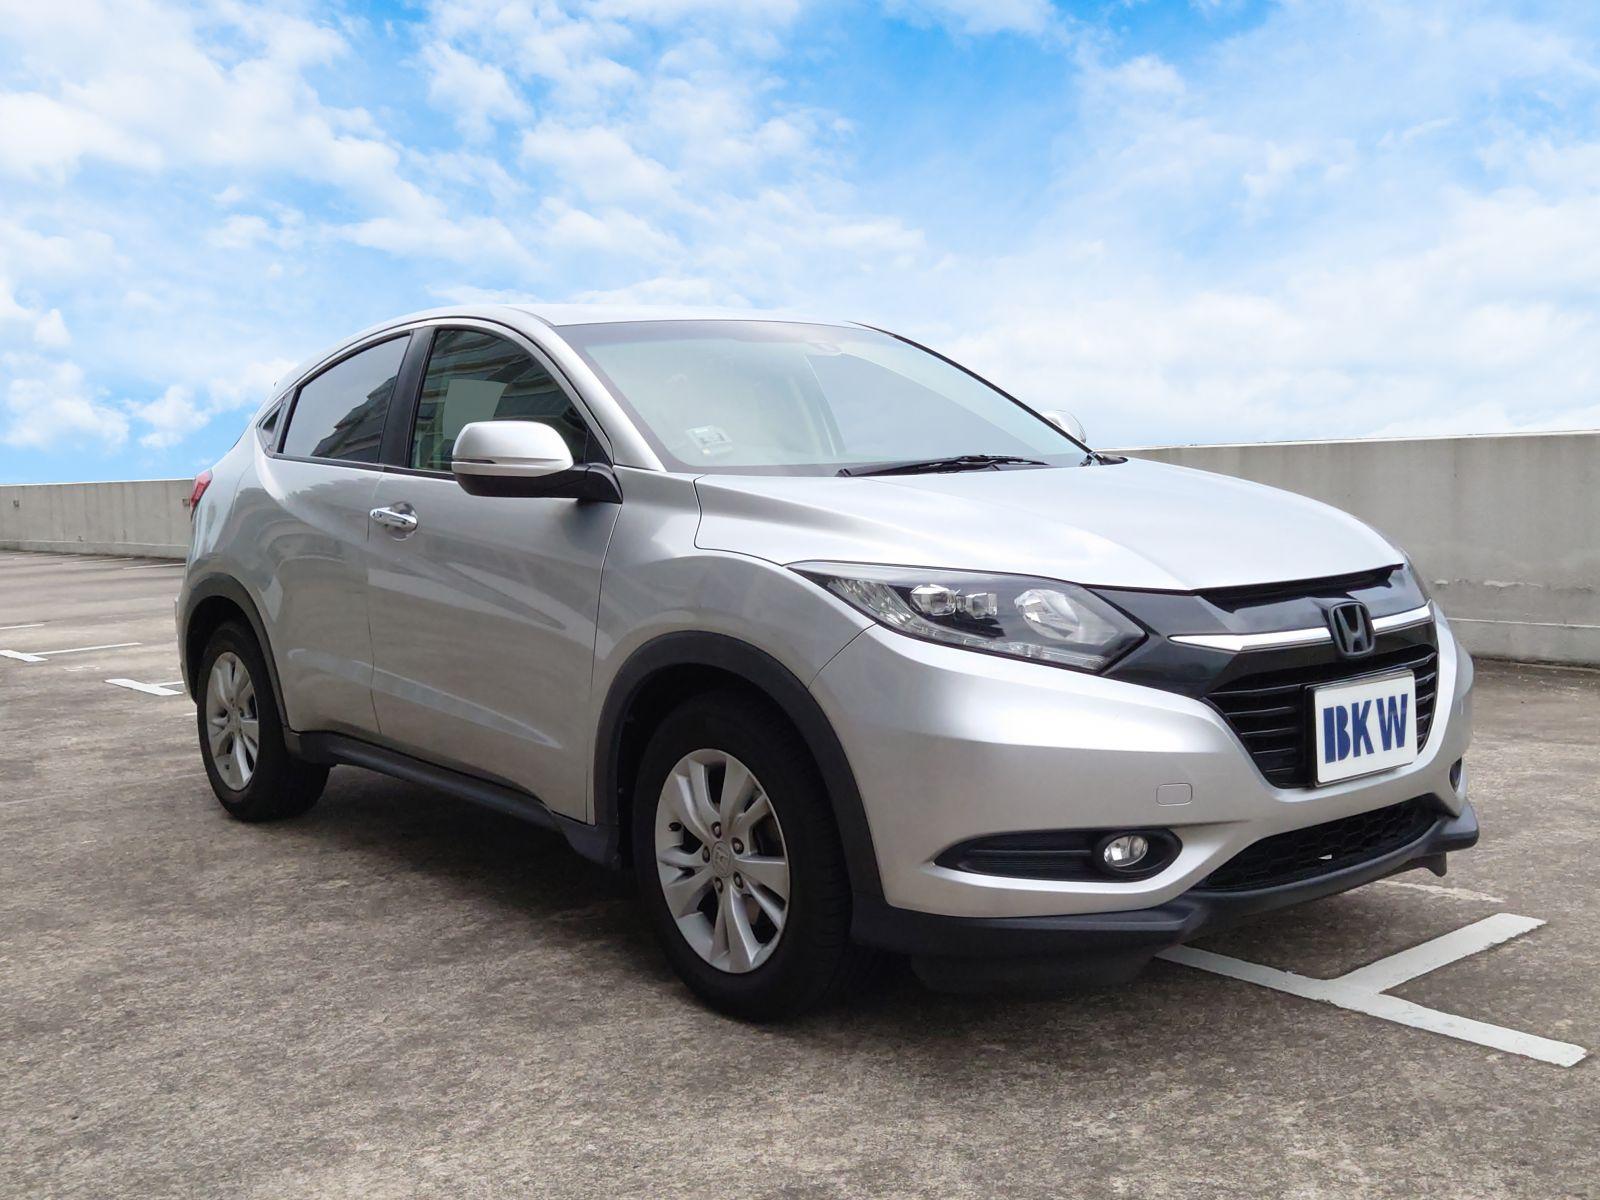 Honda Vezel 1.5A (For Rent)